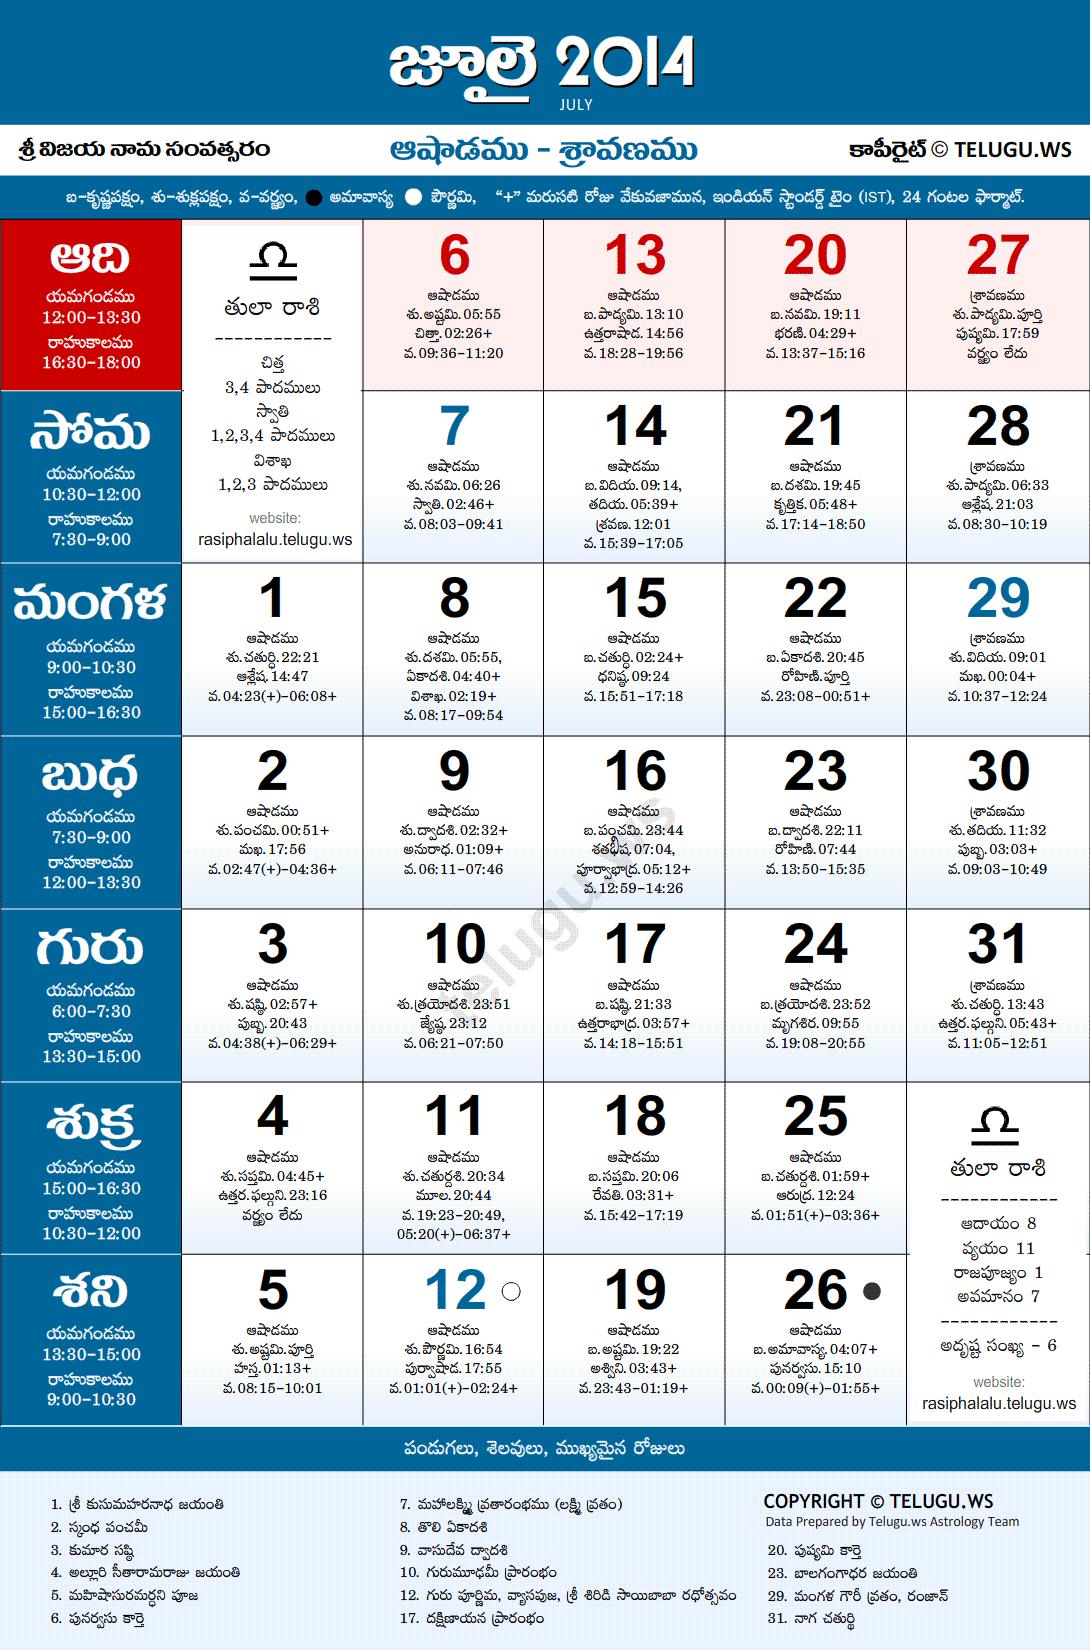 Telugu calendar 2014 may pdf print with festivals & holidays list.